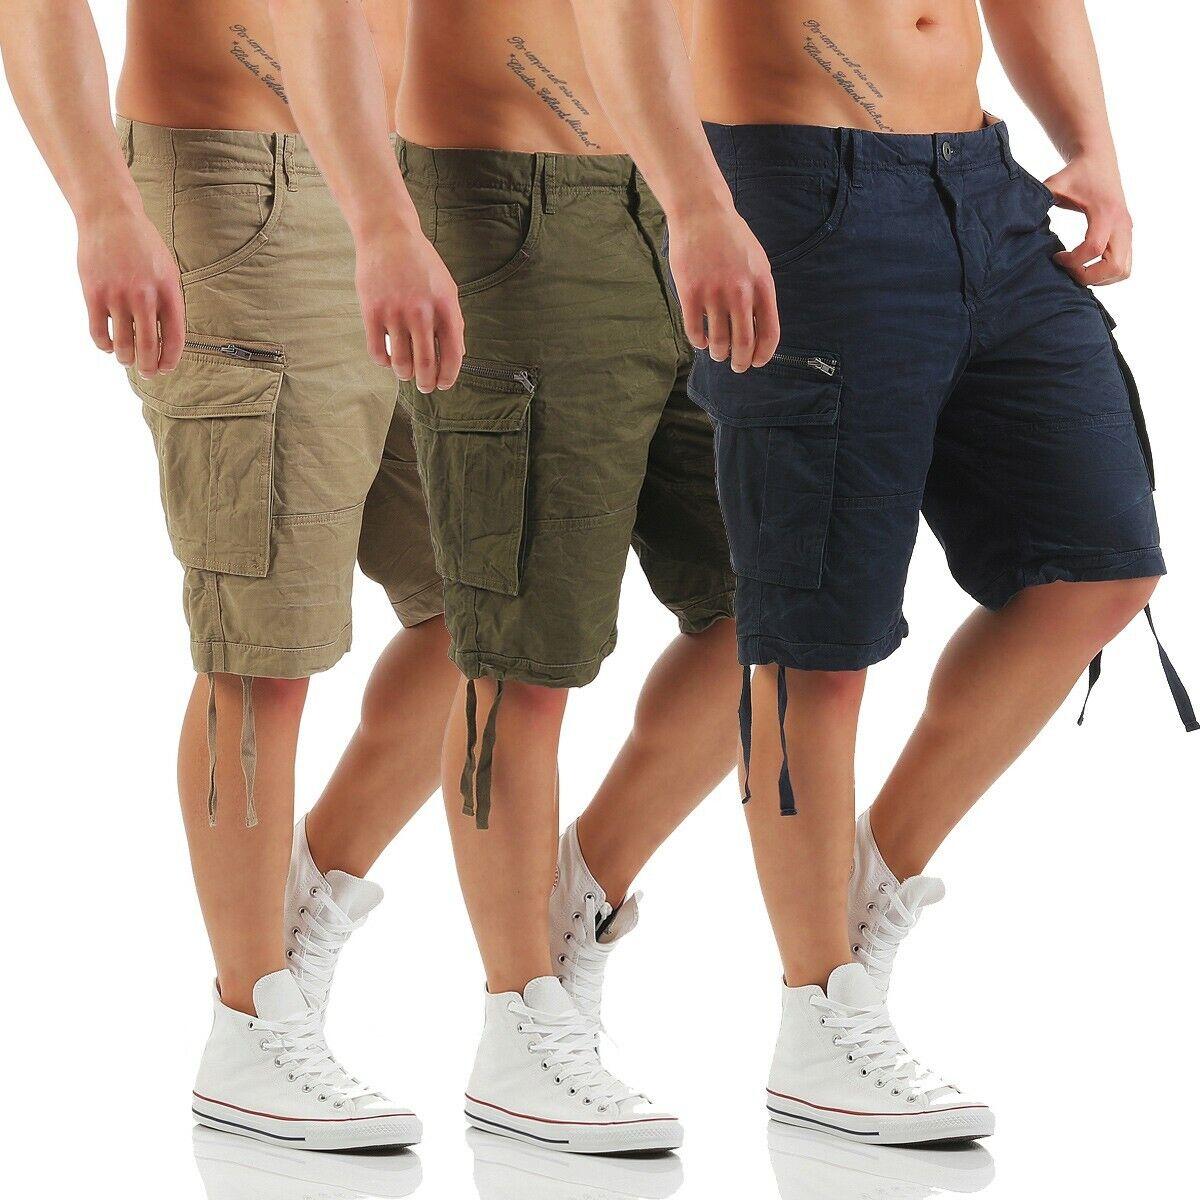 JACK & JONES - CHOP Cargo Shorts - Bermuda Jeans - Kurze Hose - NEU